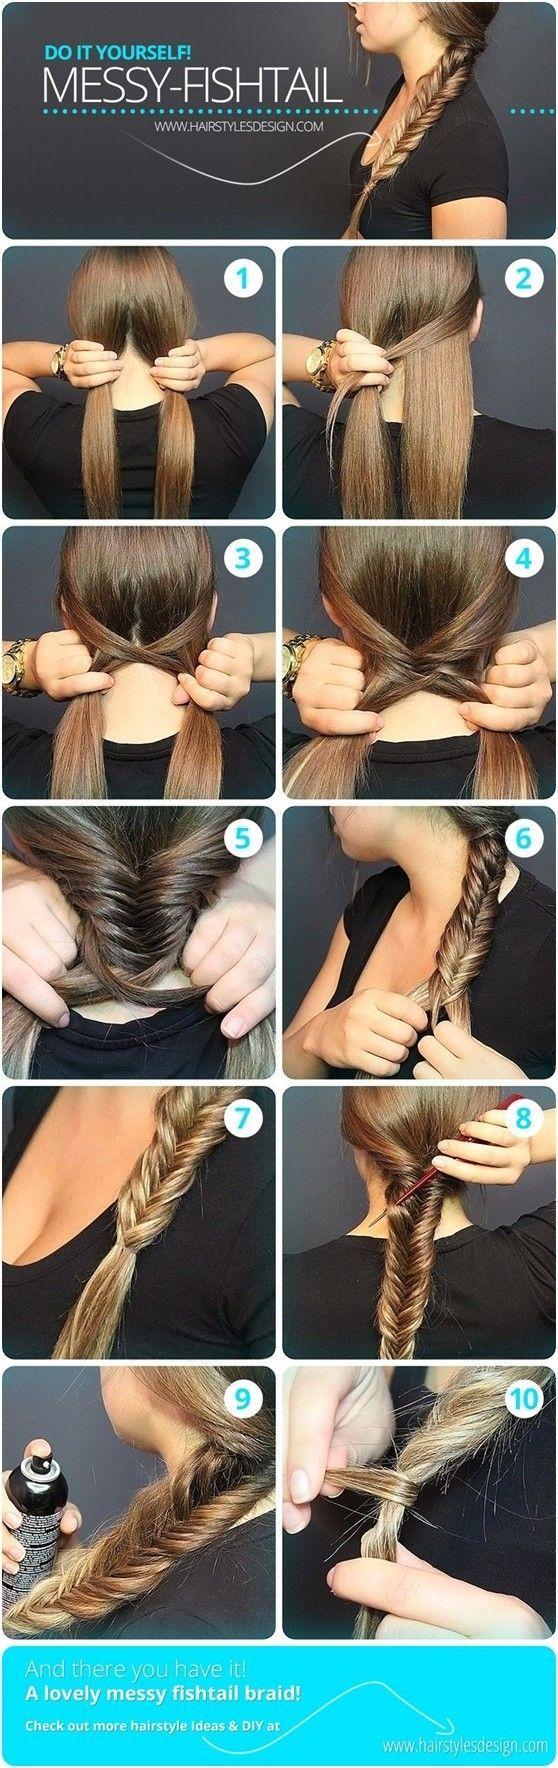 Messy Fishtail Braid Tutorial: Side Loose Braided Hairstyles #hair #braid